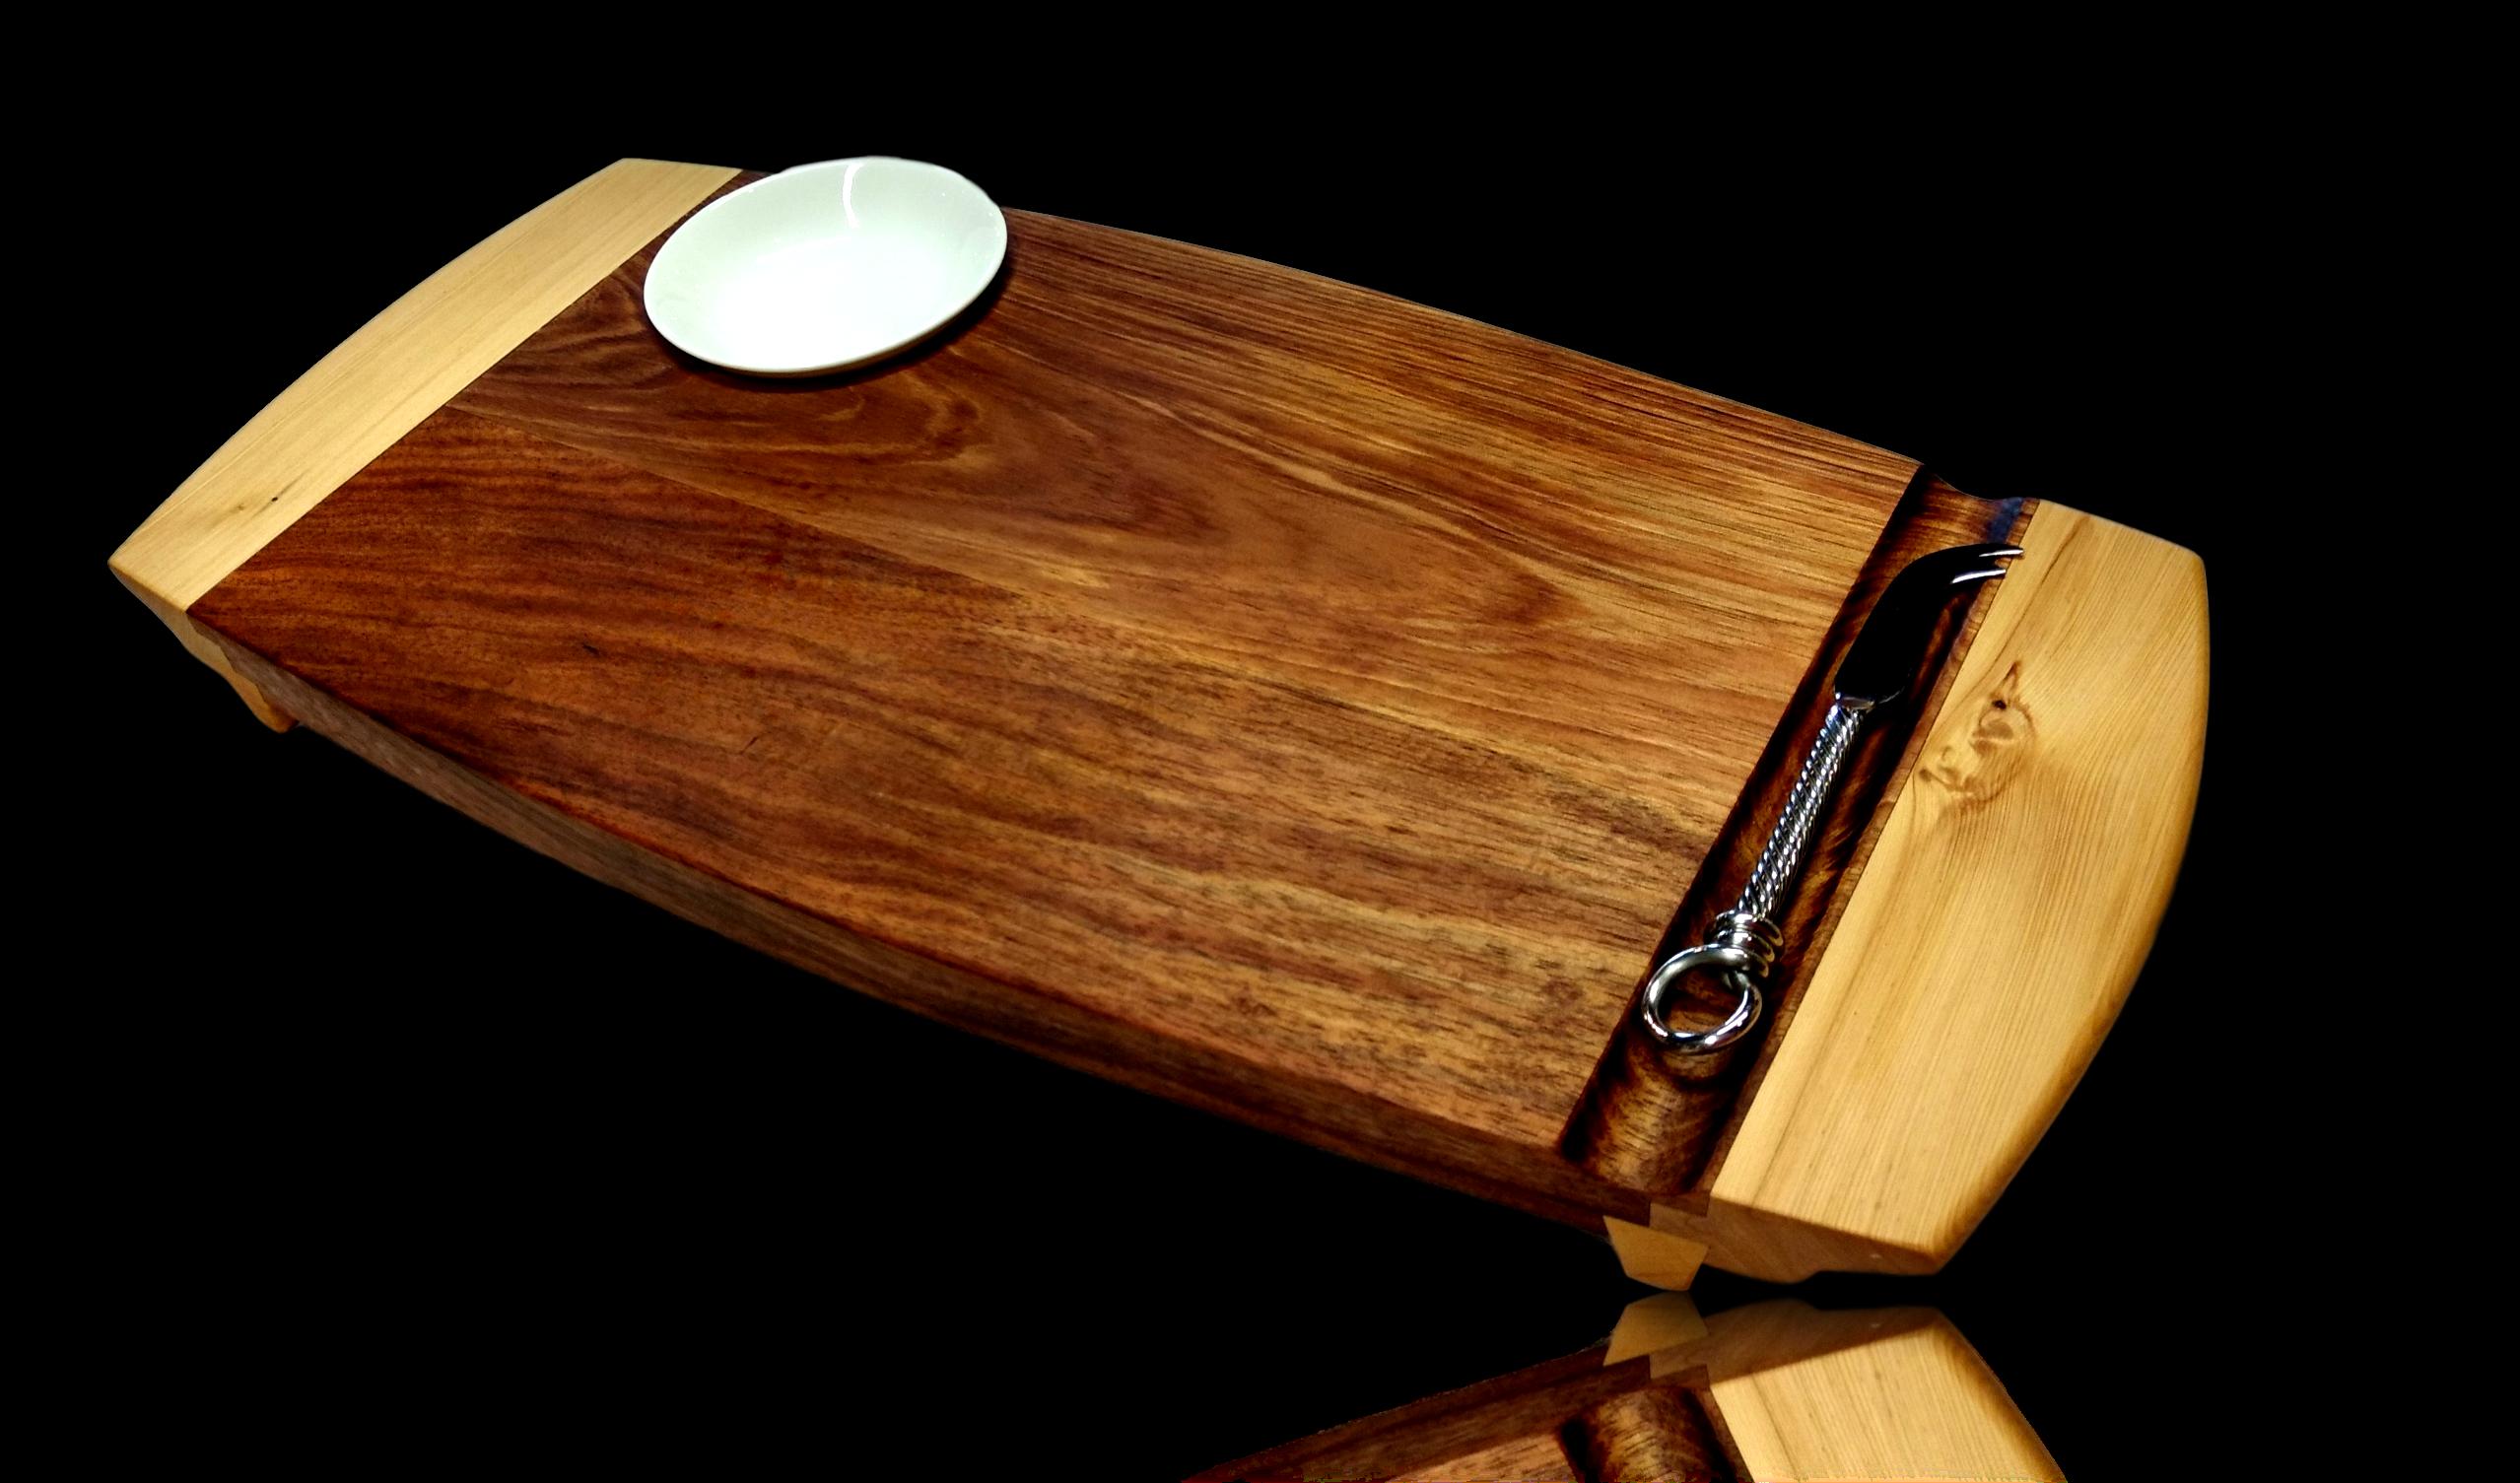 Blackwood & Huon Pine Cheese Board